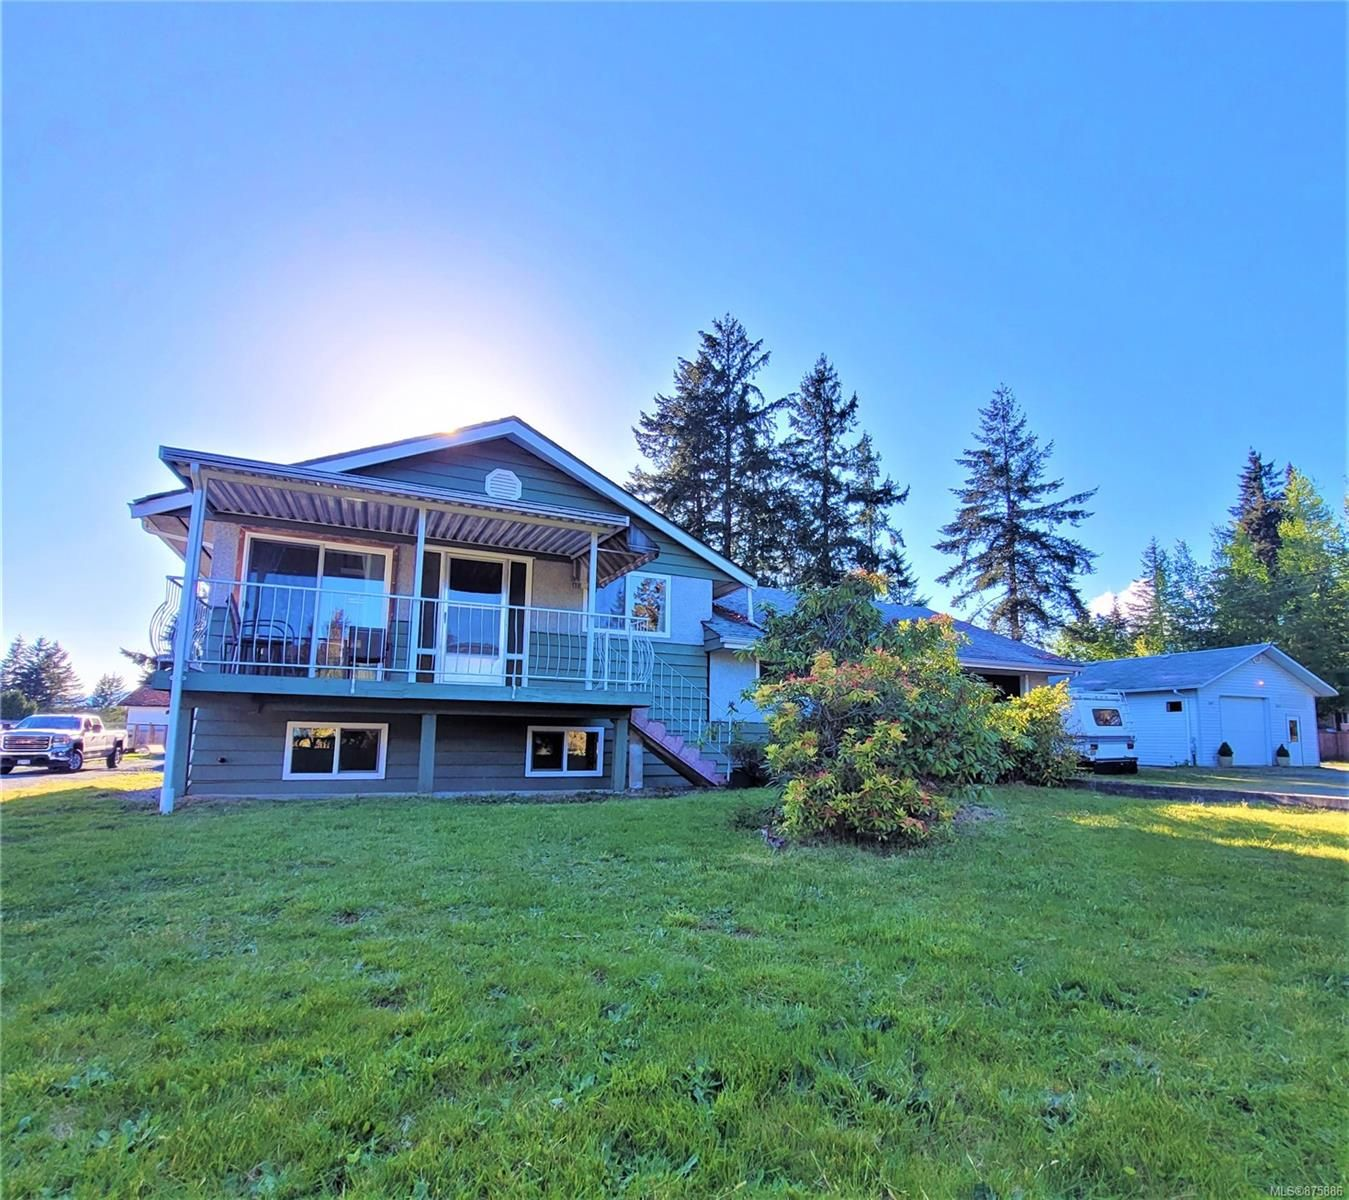 Main Photo: 6284 Cherry creek Rd in : PA Alberni Valley House for sale (Port Alberni)  : MLS®# 875886